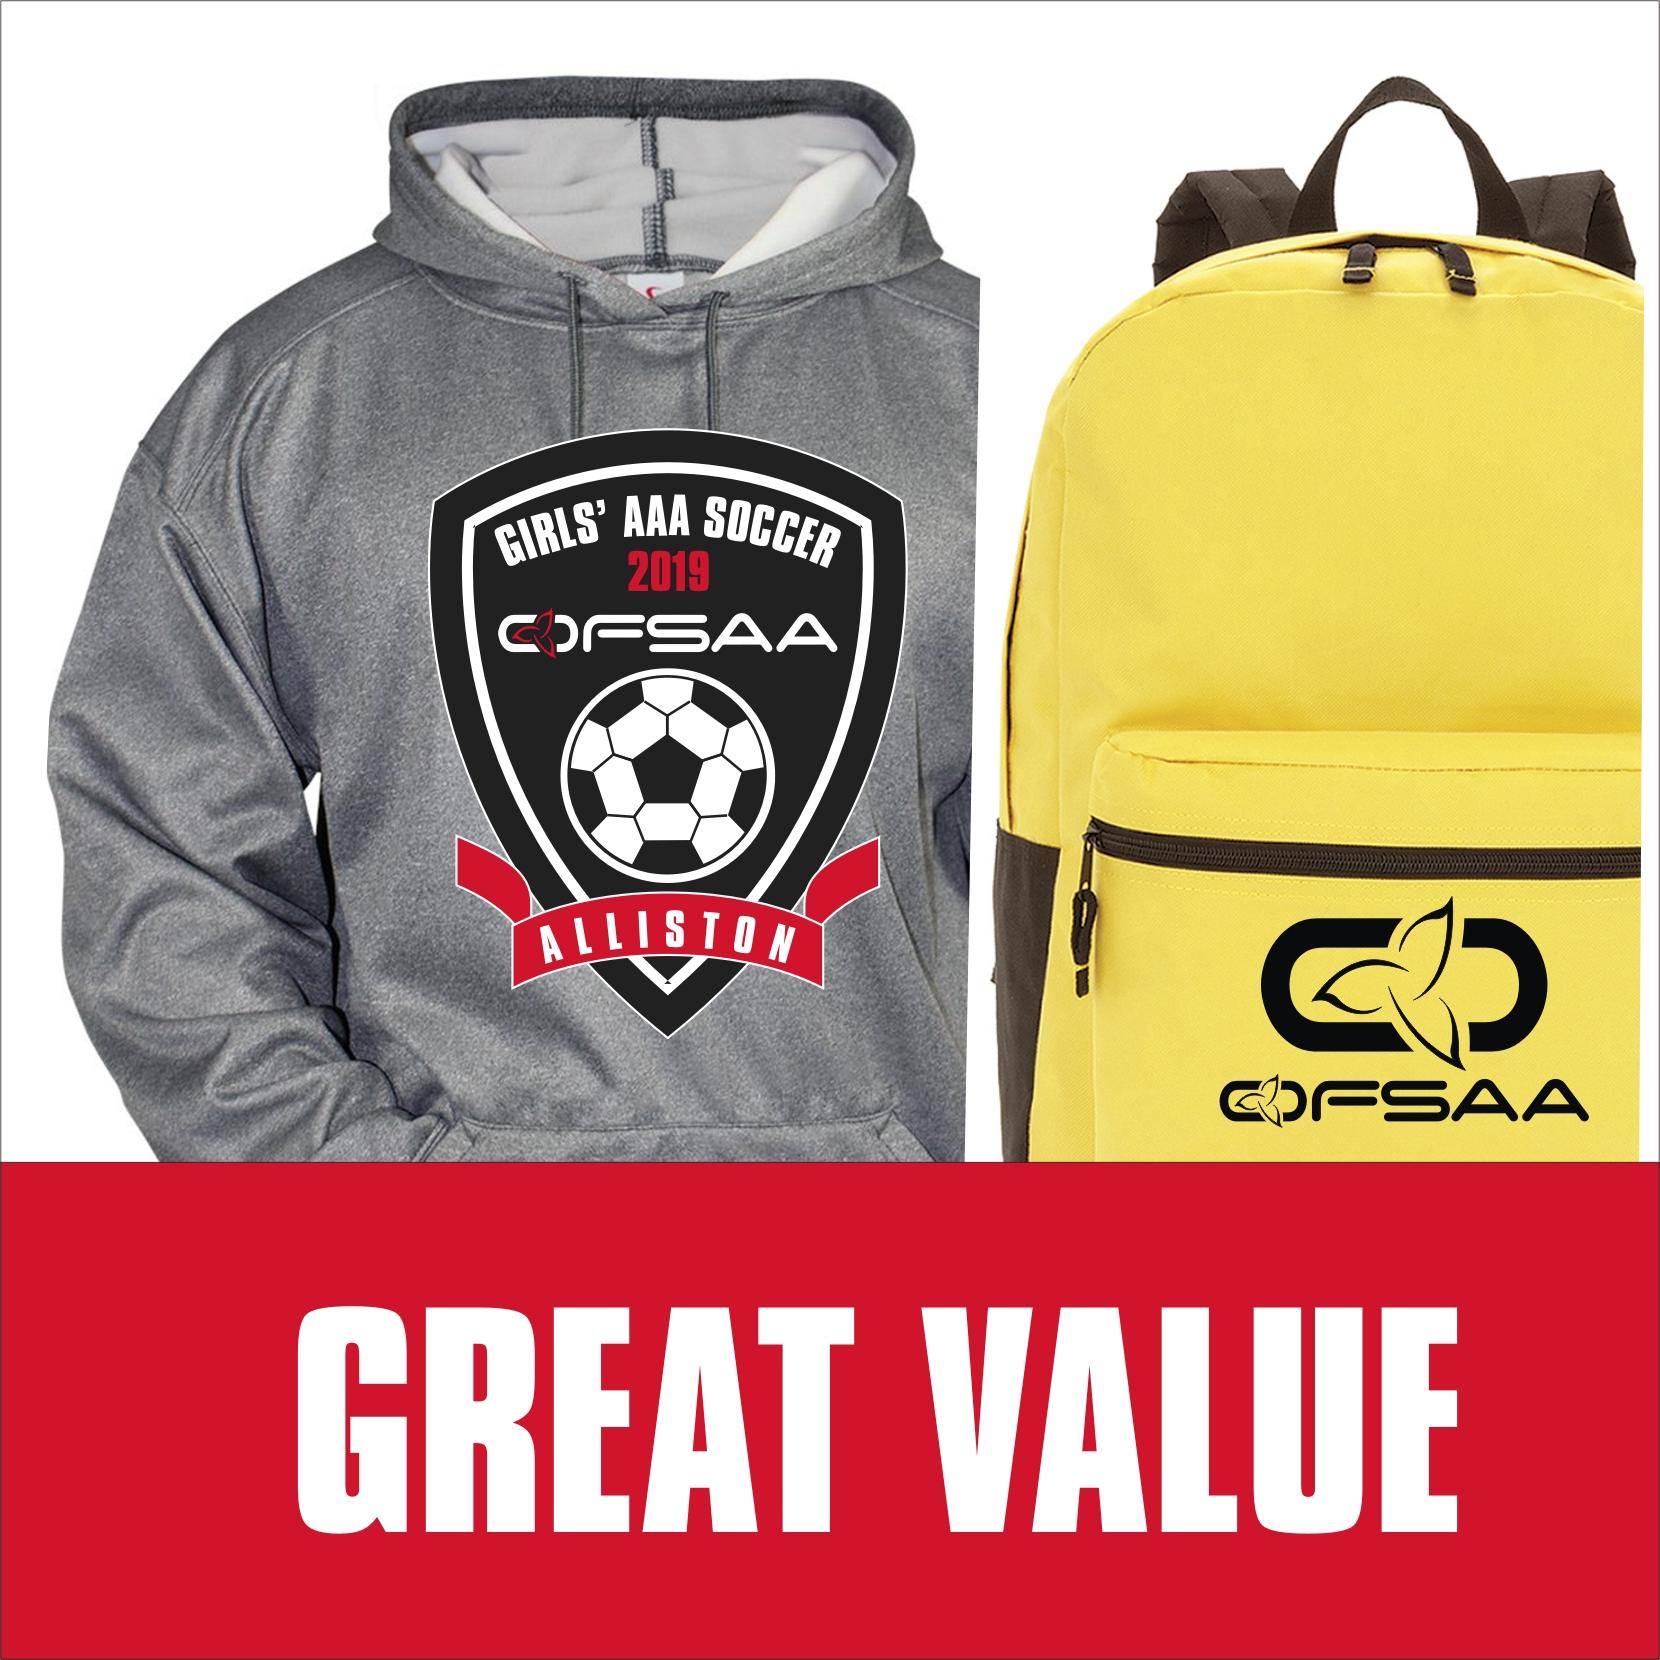 2019 Girls AAA Soccer bag bundle.jpg